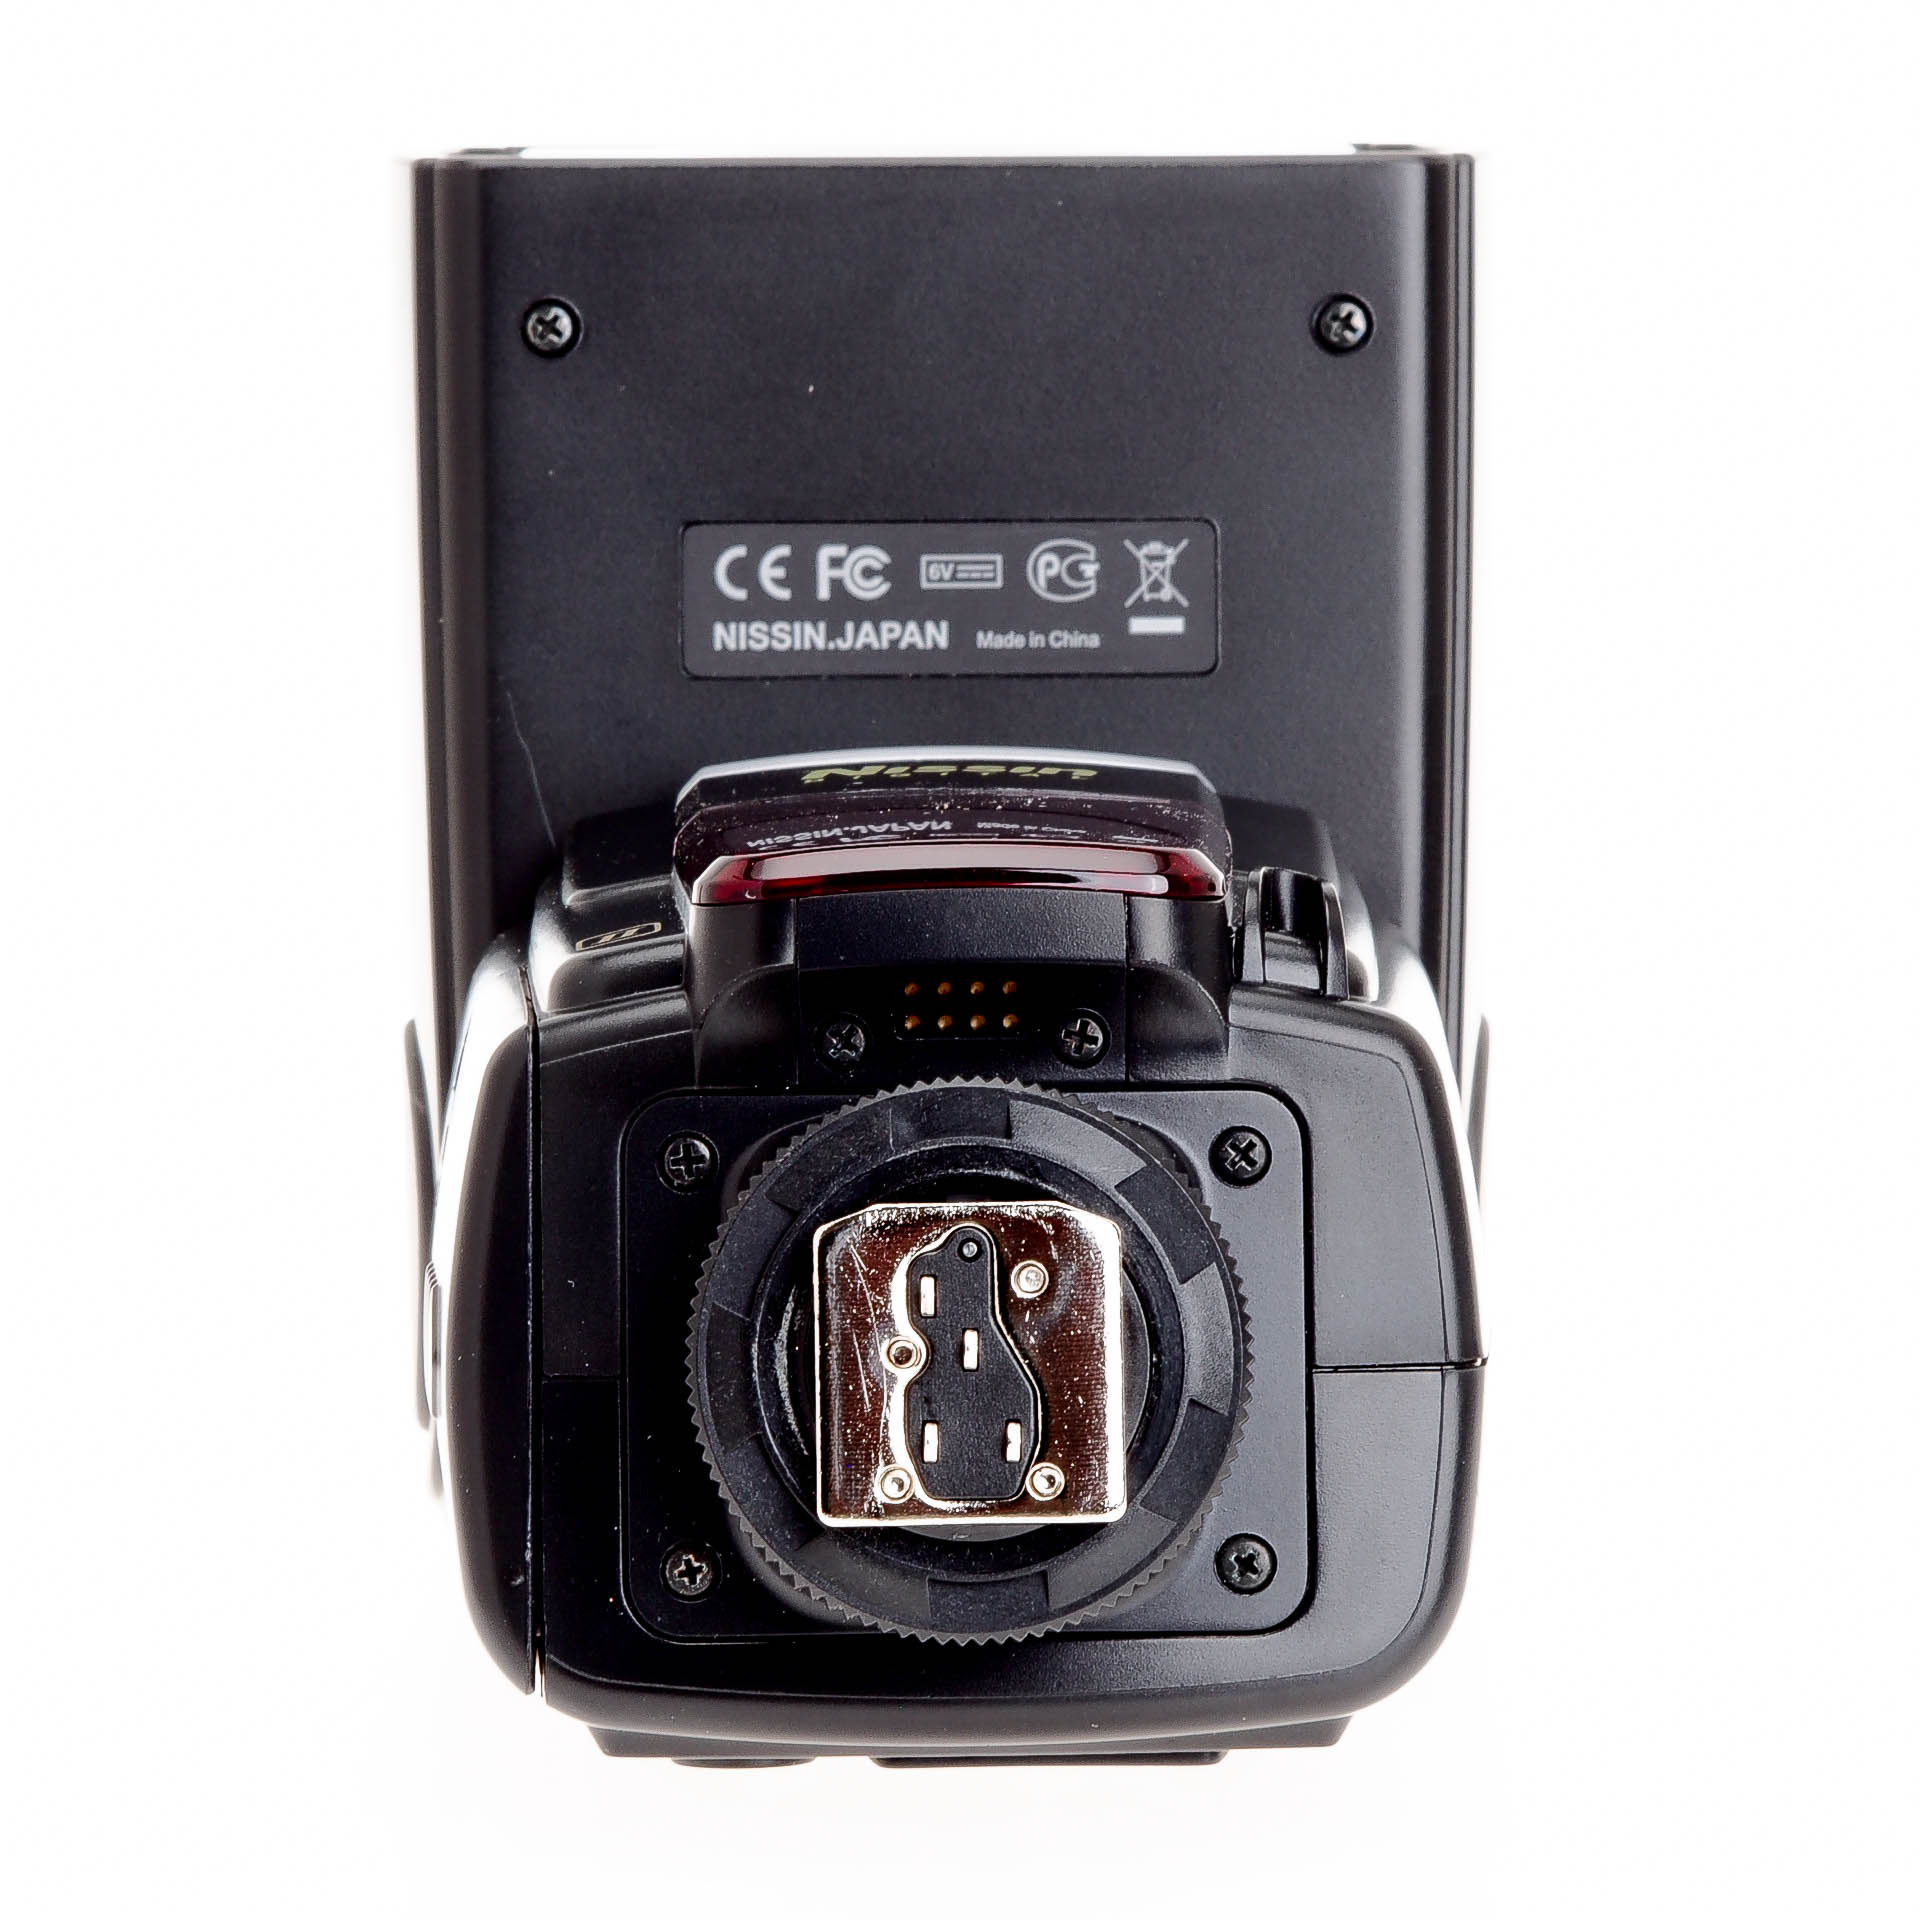 Nikon Nissin Di866 Mark II Shoe Mount Speedlite Flash ND866MKII-N